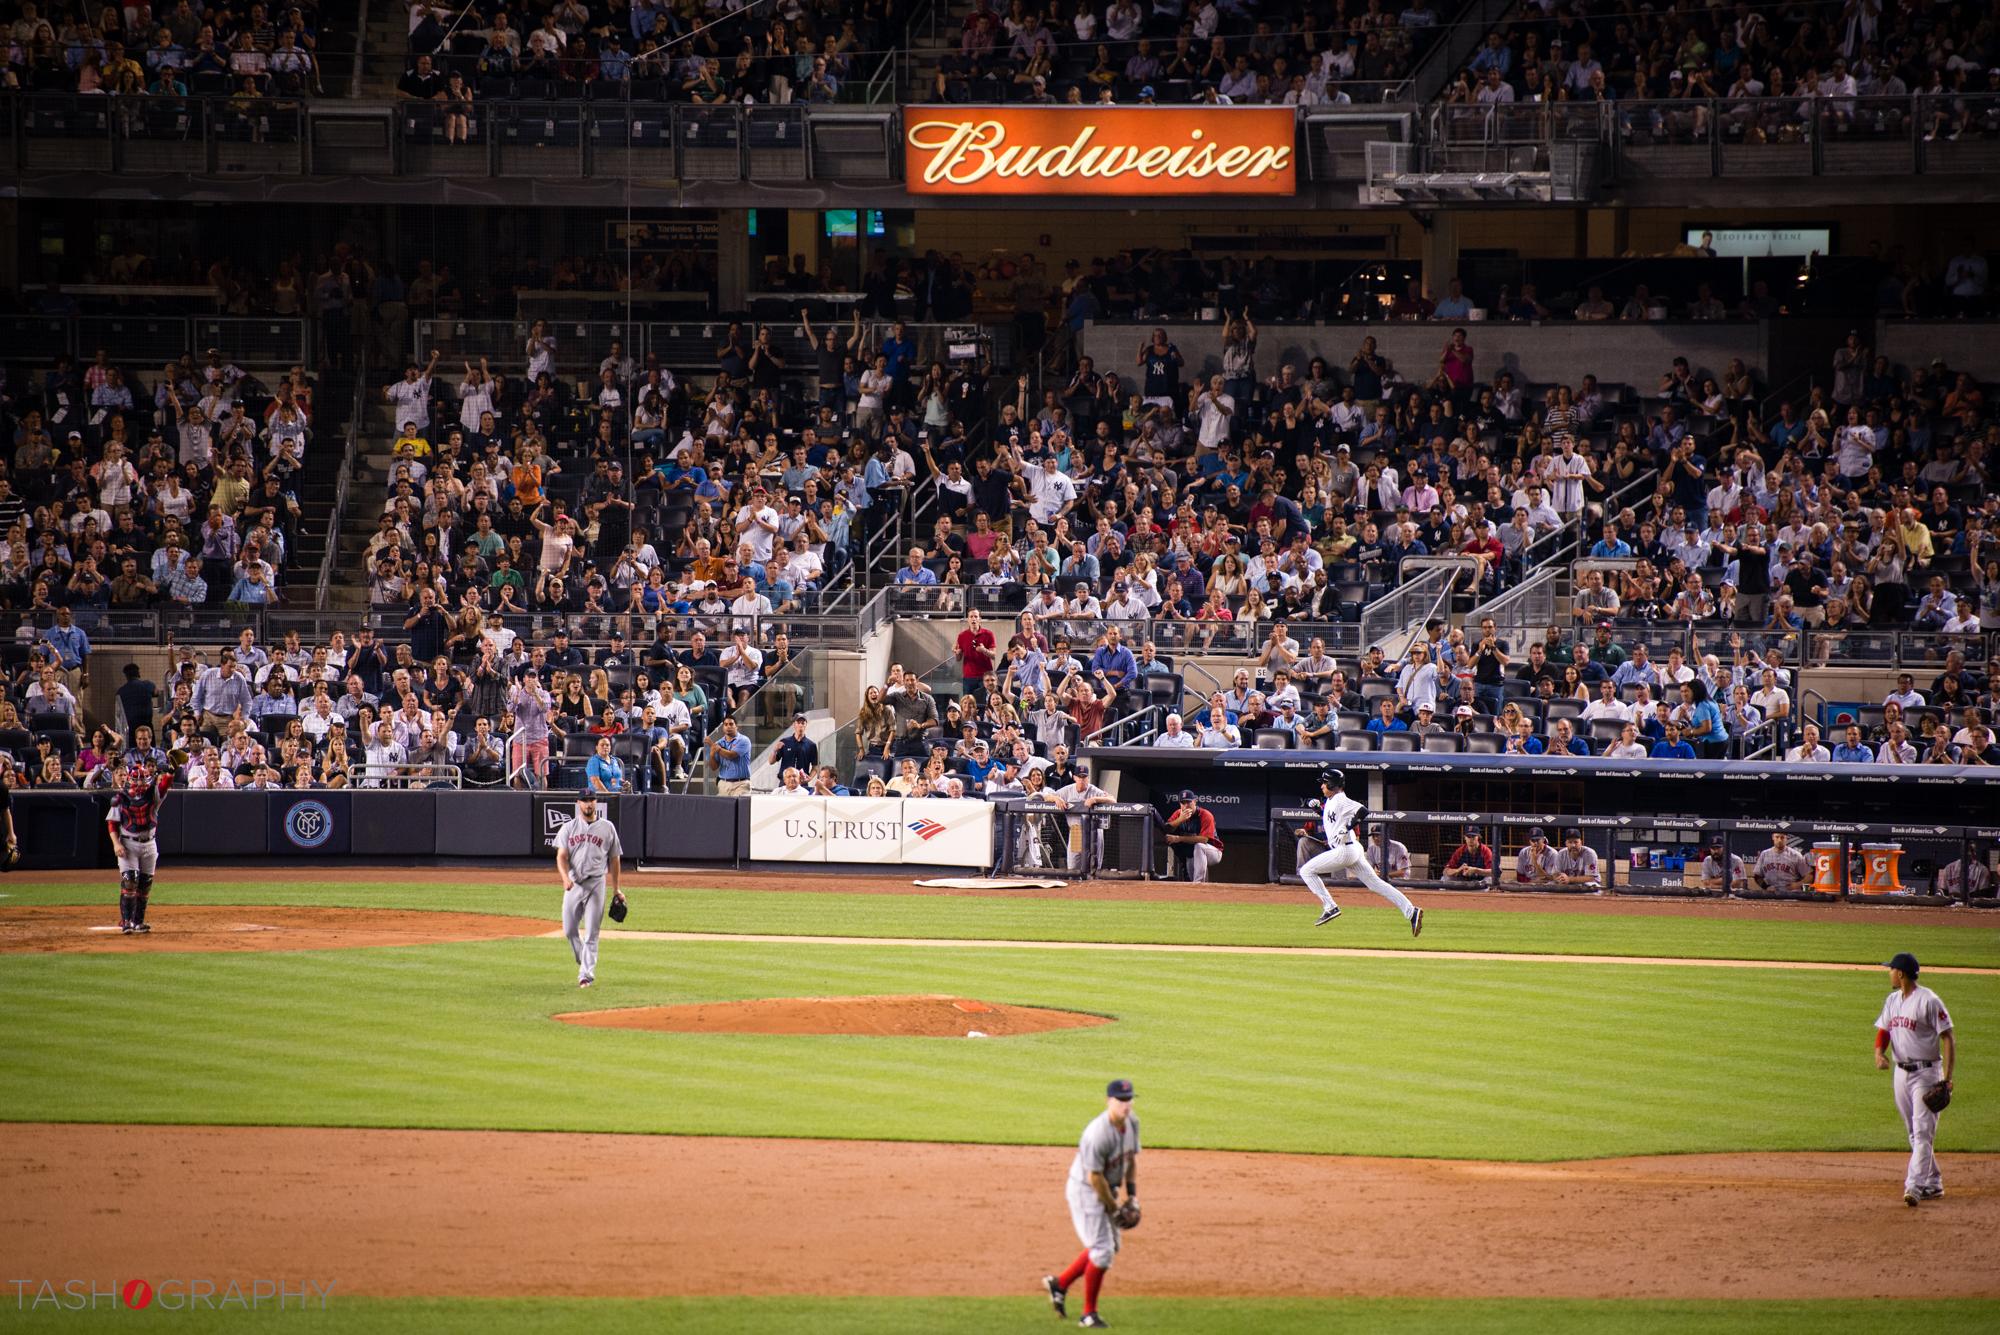 Yankees-090314-20.jpg